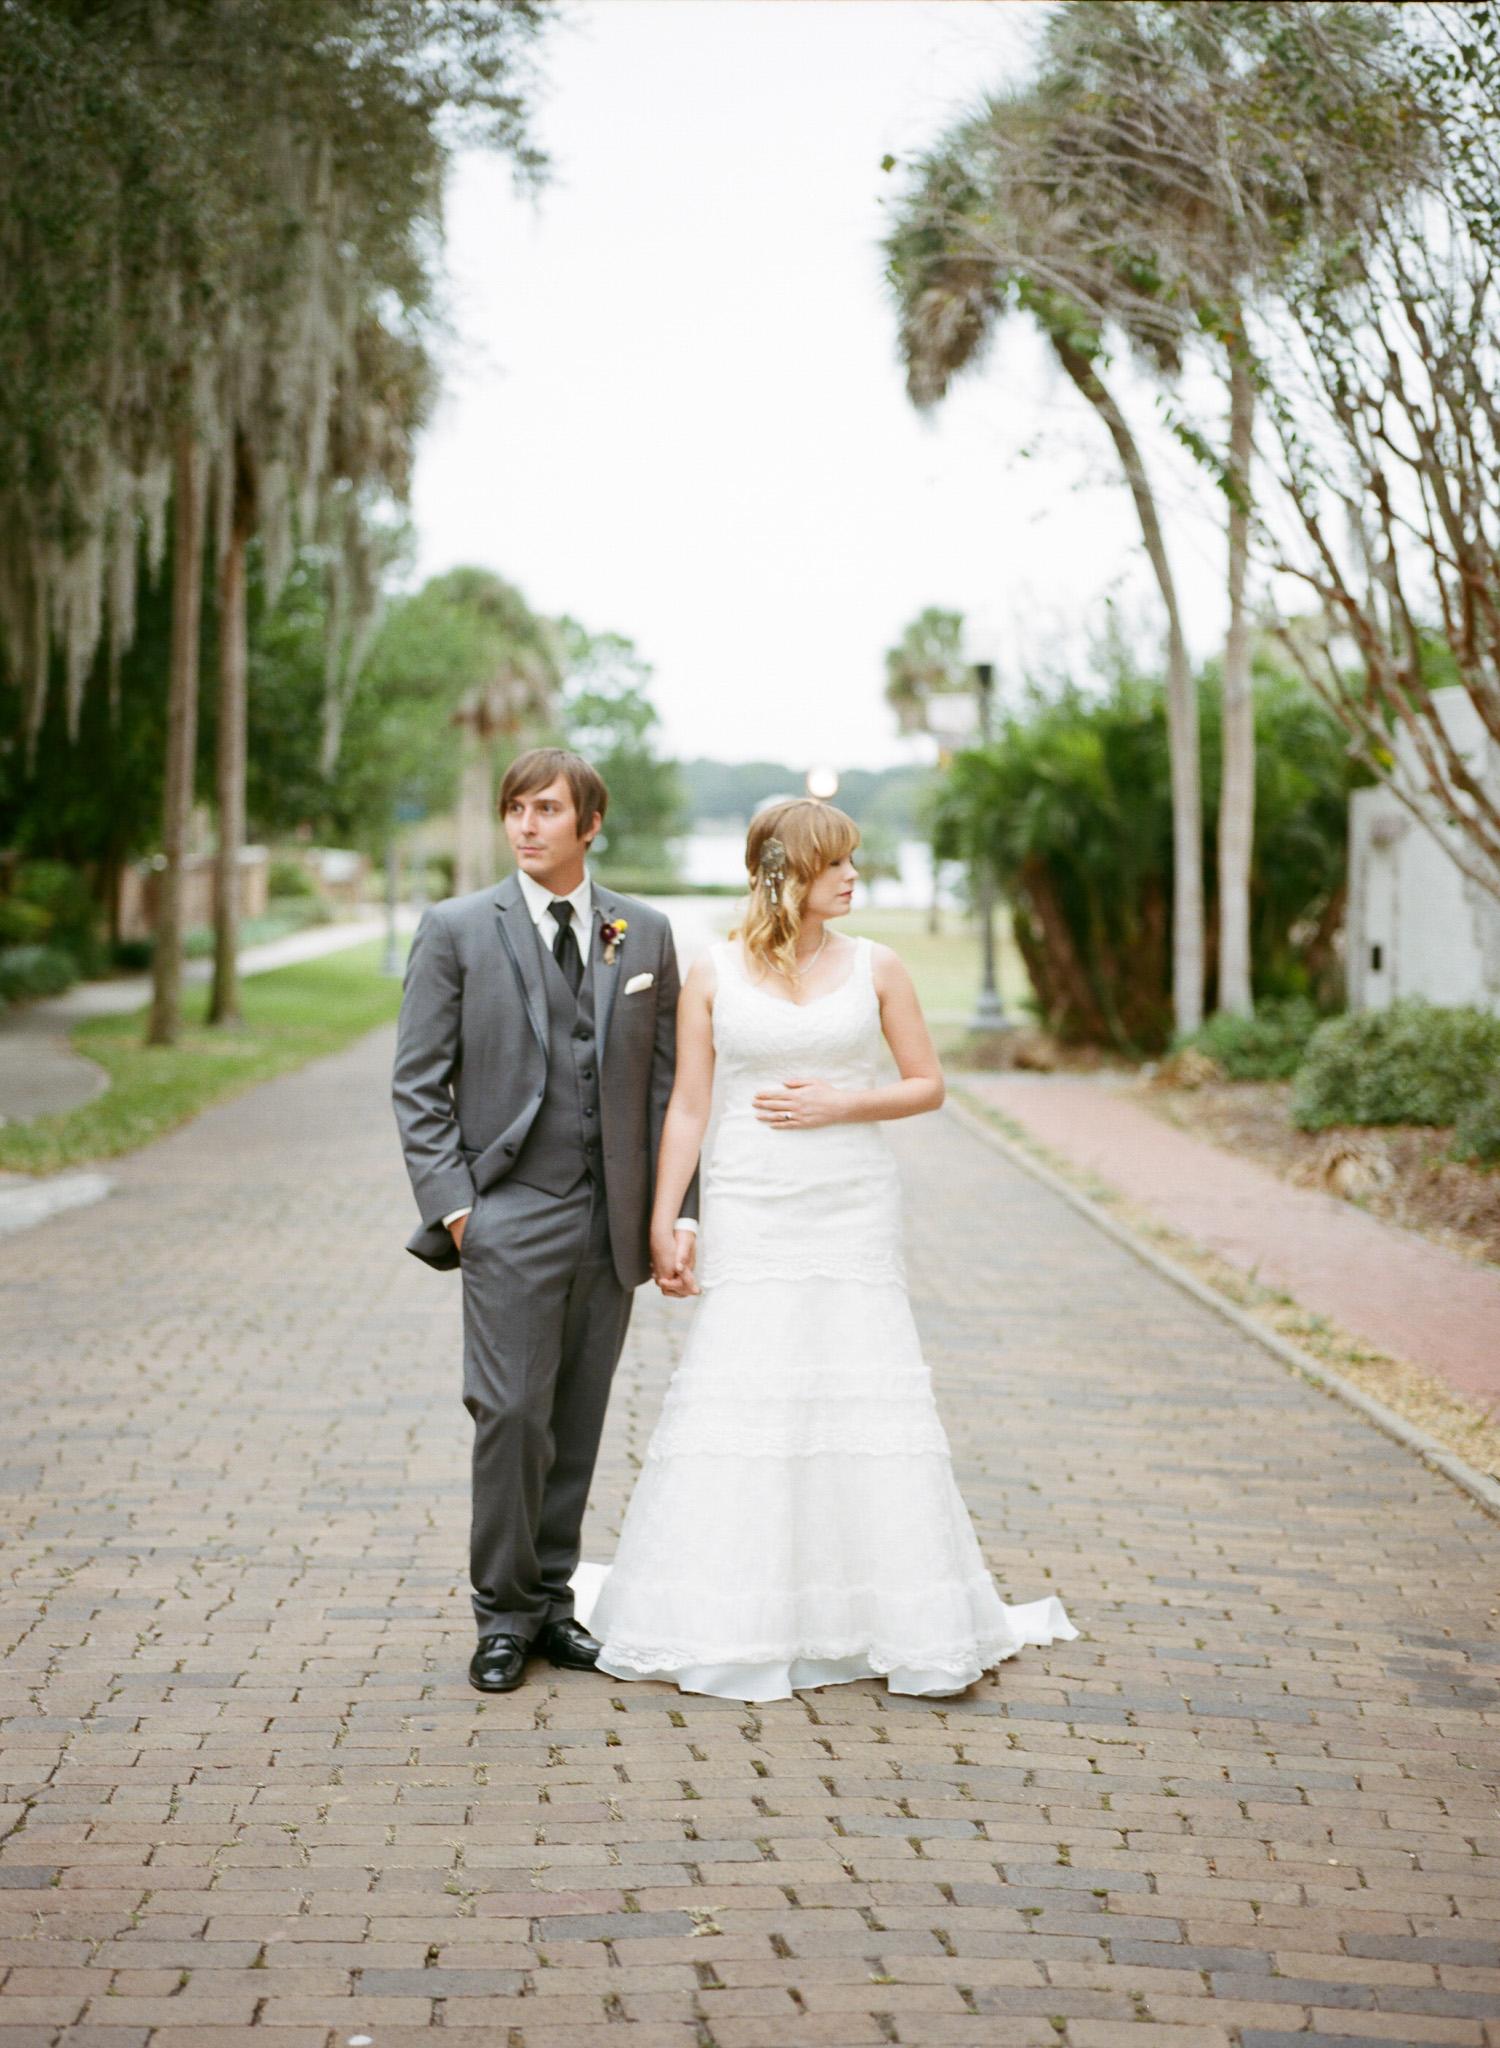 Christina-Matt-Maitland-Art-Center-Wedding46.JPG